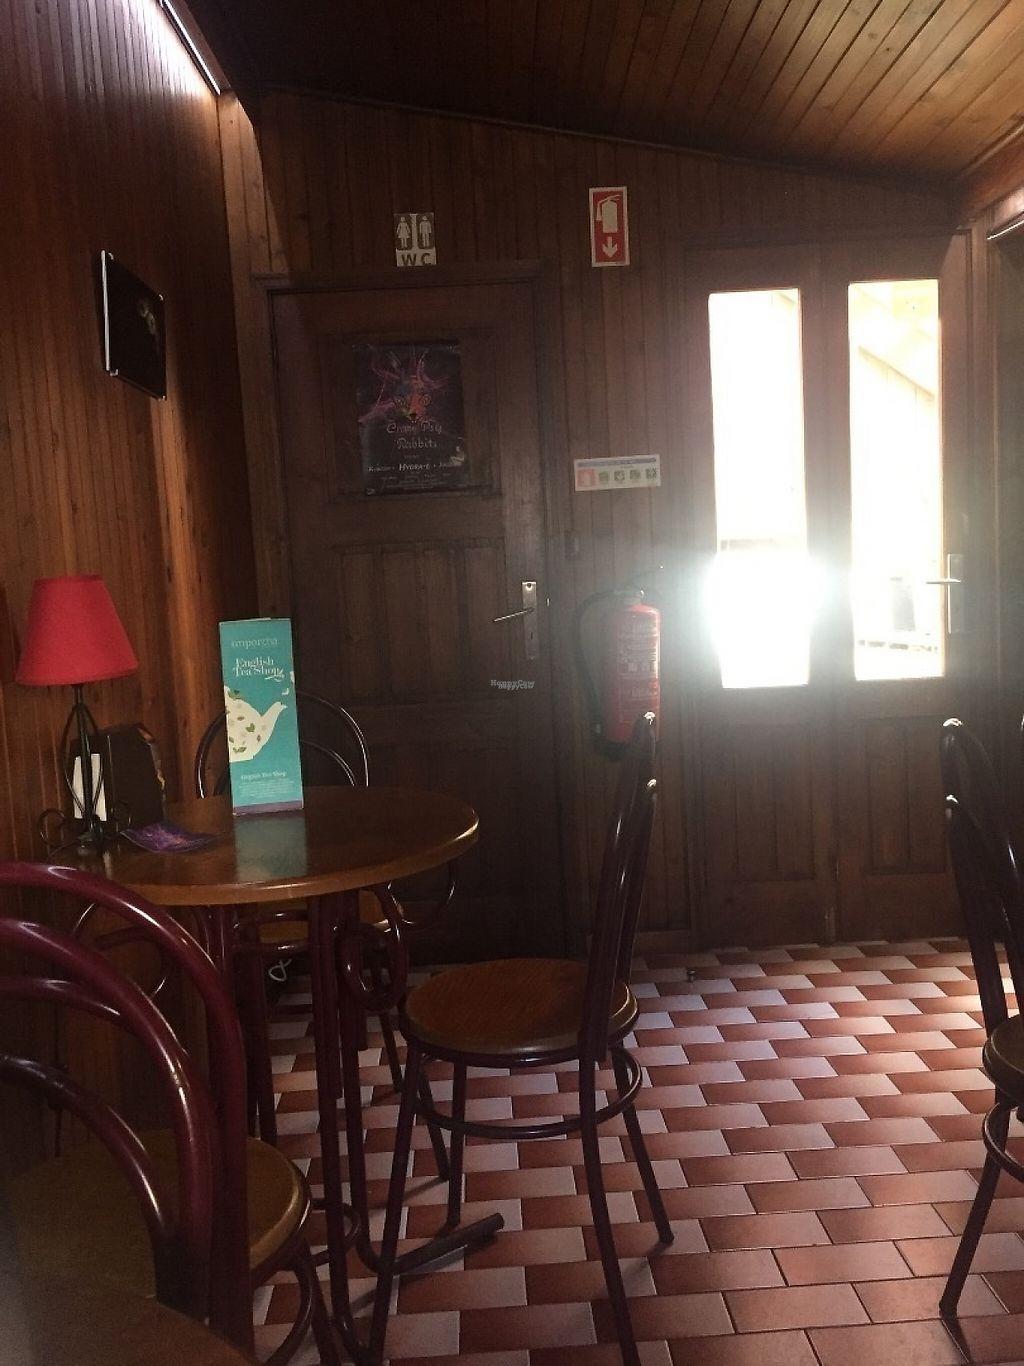 "Photo of Pes Verdes - Casa de Cha  by <a href=""/members/profile/StevieSurf"">StevieSurf</a> <br/>Interior  <br/> April 17, 2017  - <a href='/contact/abuse/image/72466/249353'>Report</a>"